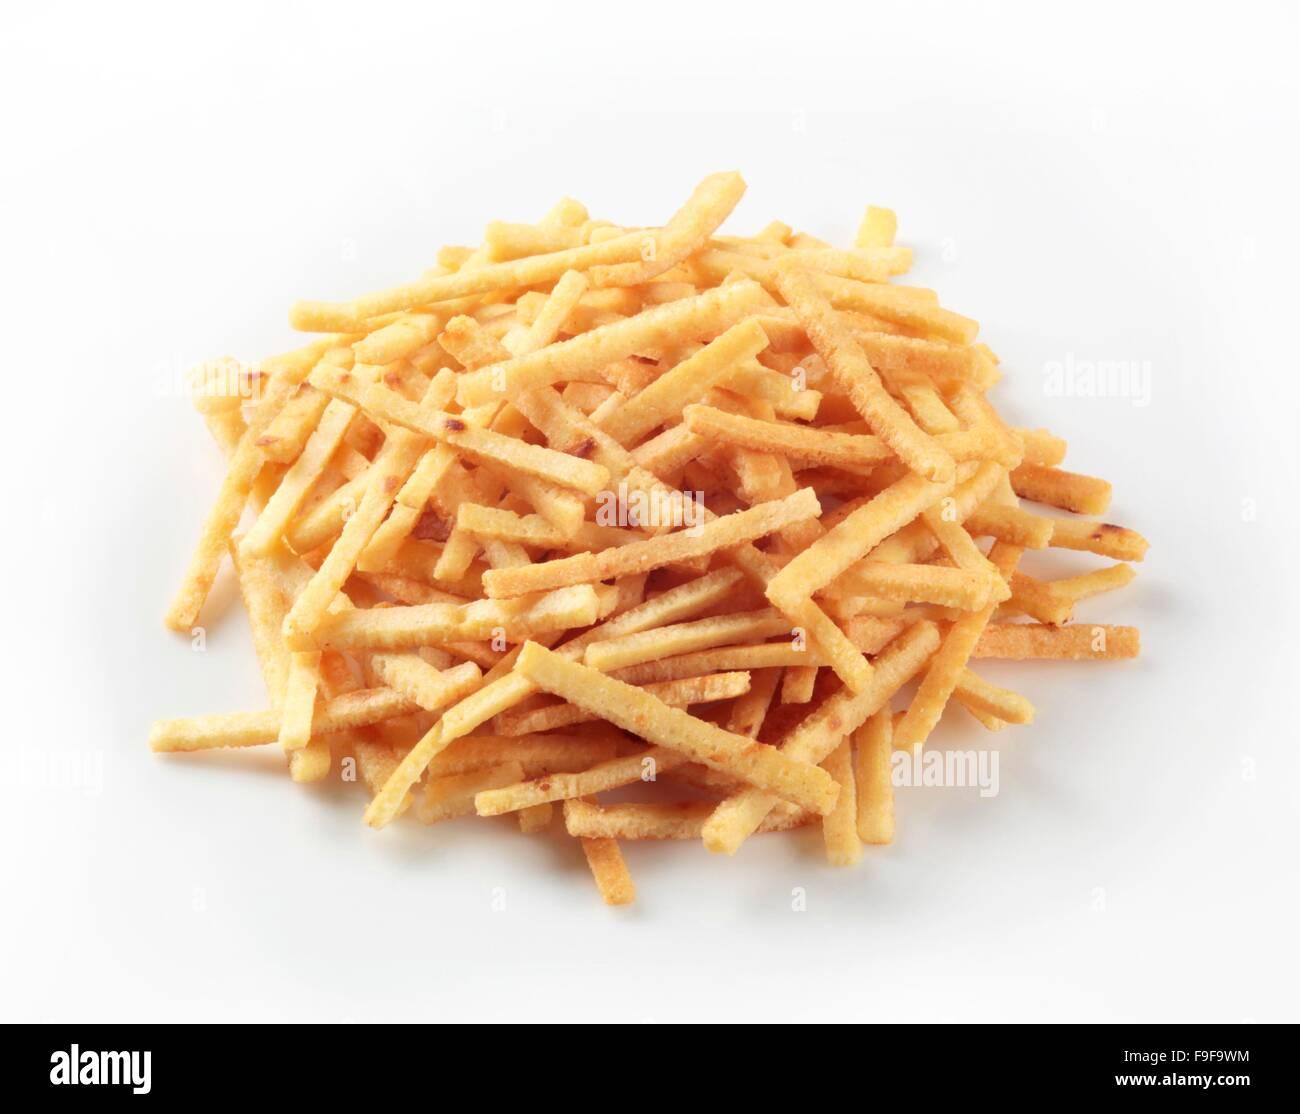 Celestine noodles - Stock Image